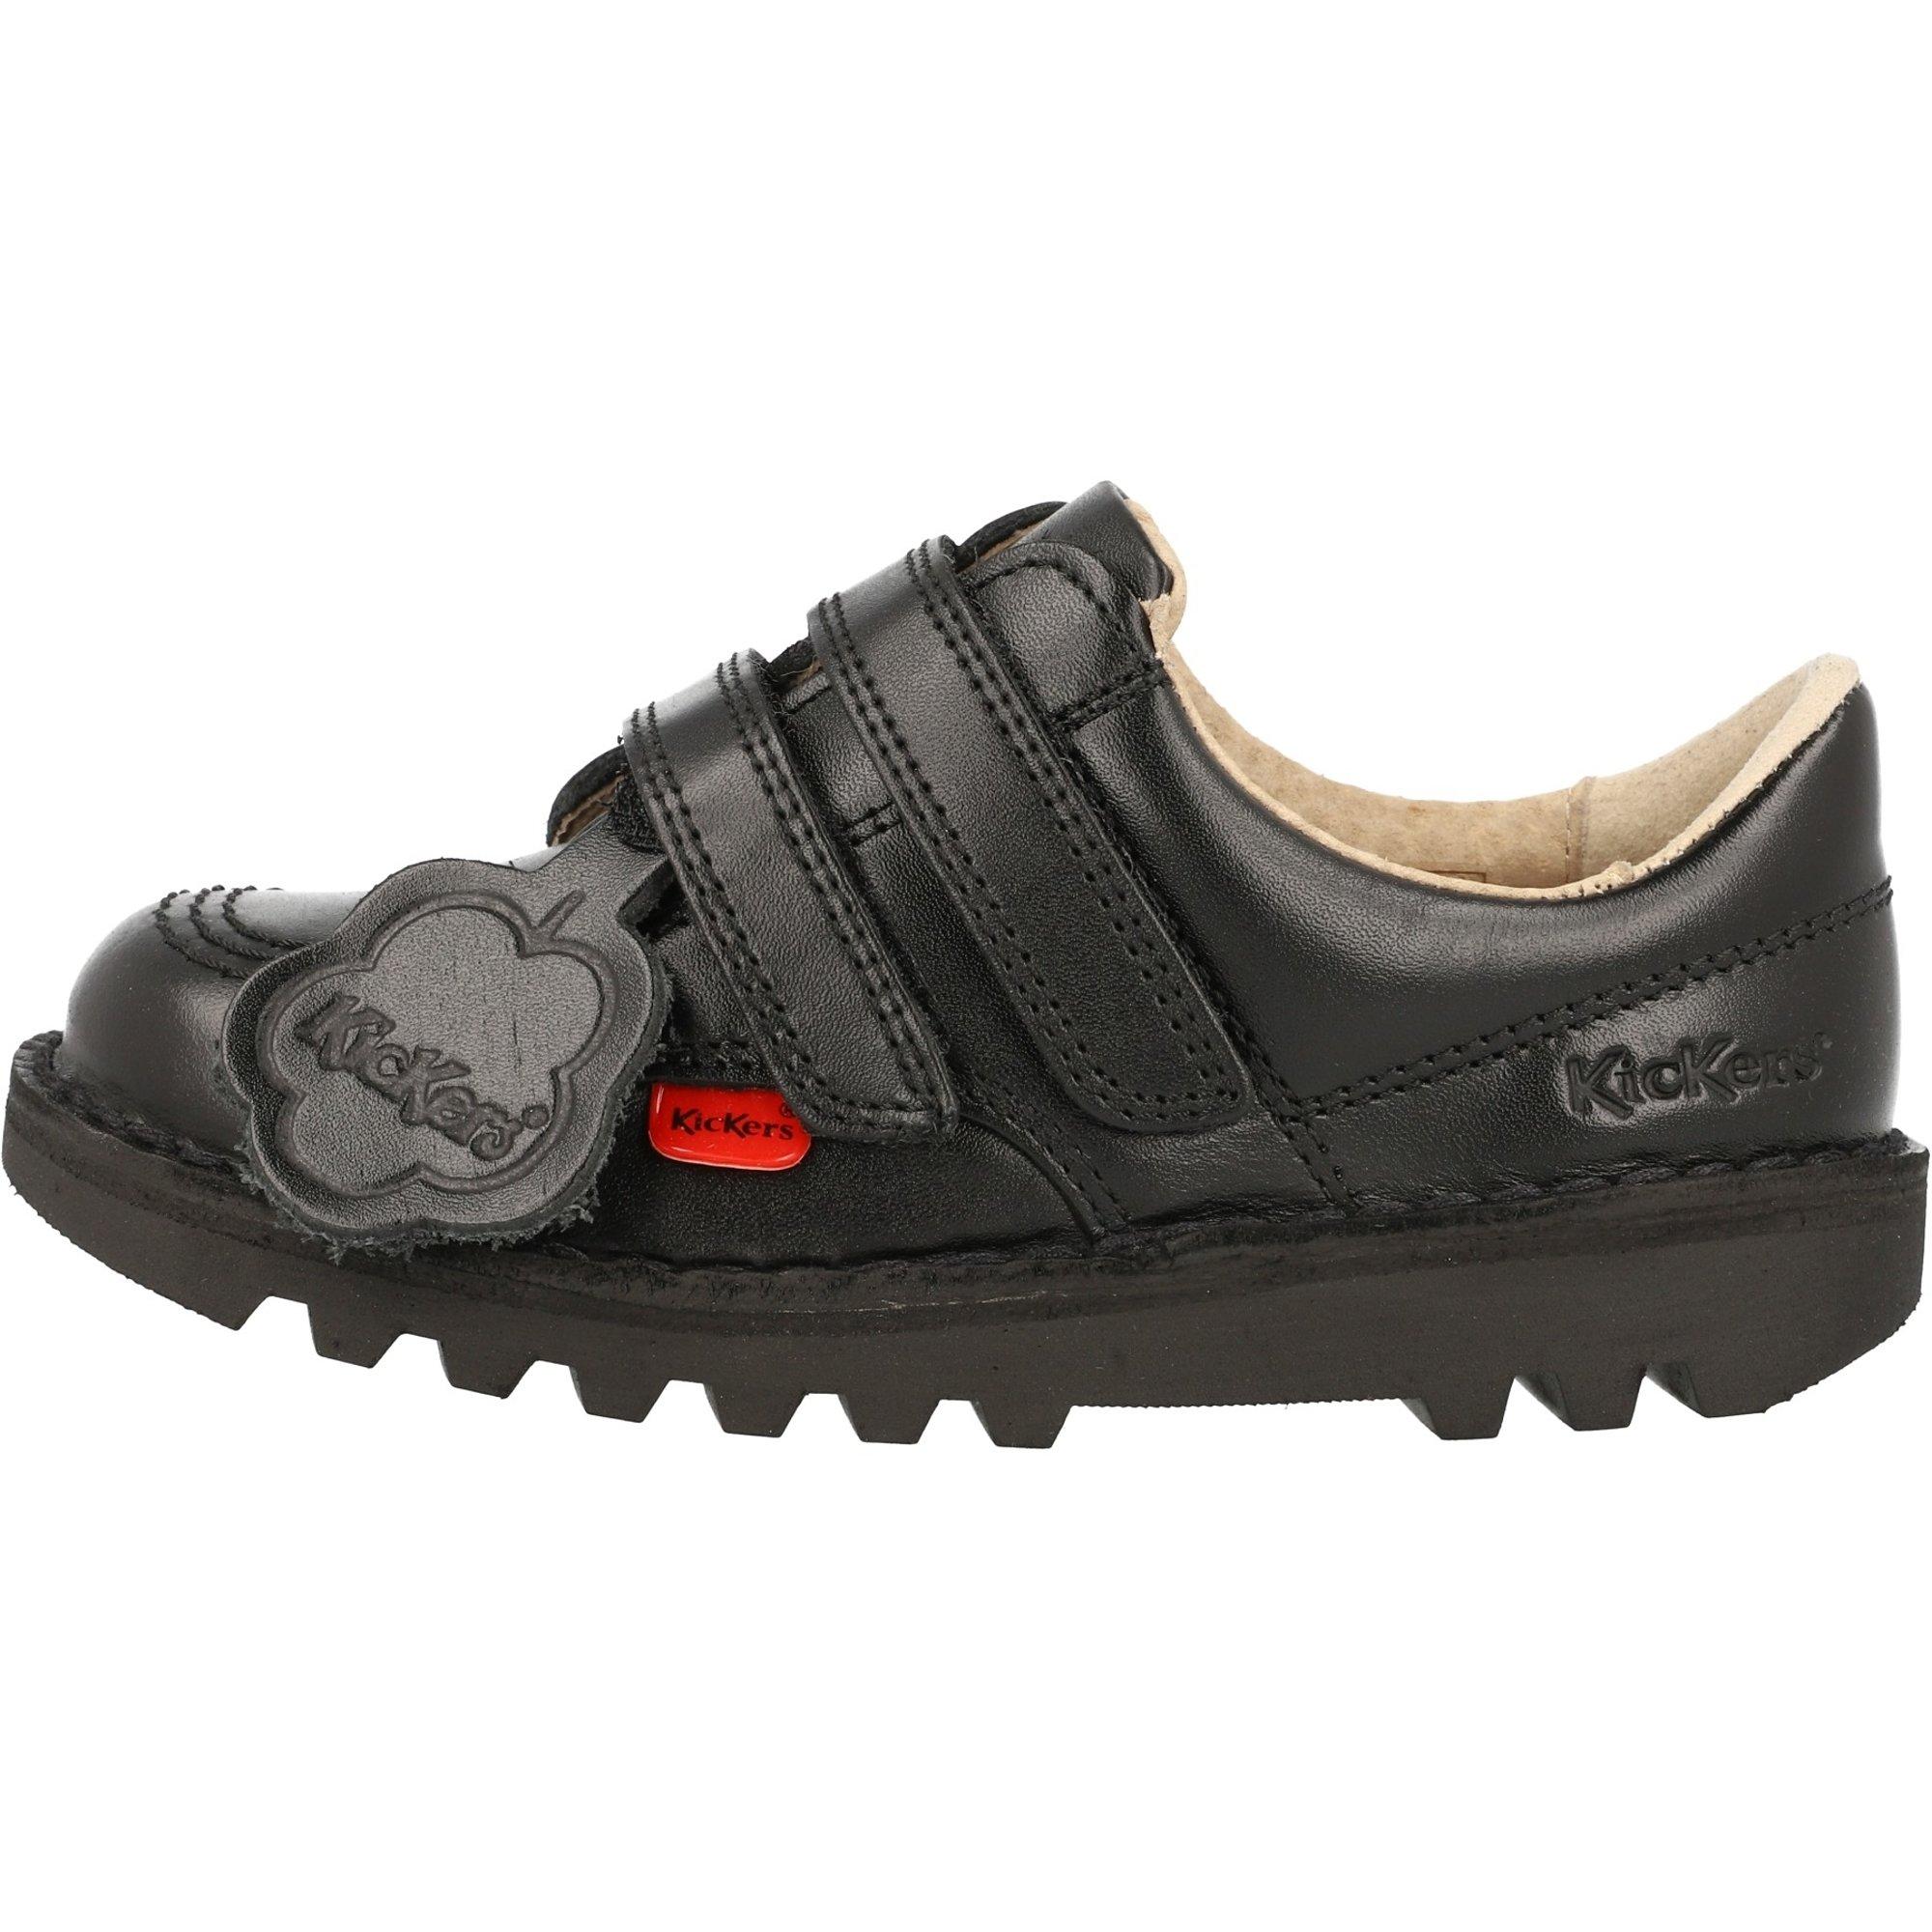 Kickers Kick Lo Vel I Black Leather 24